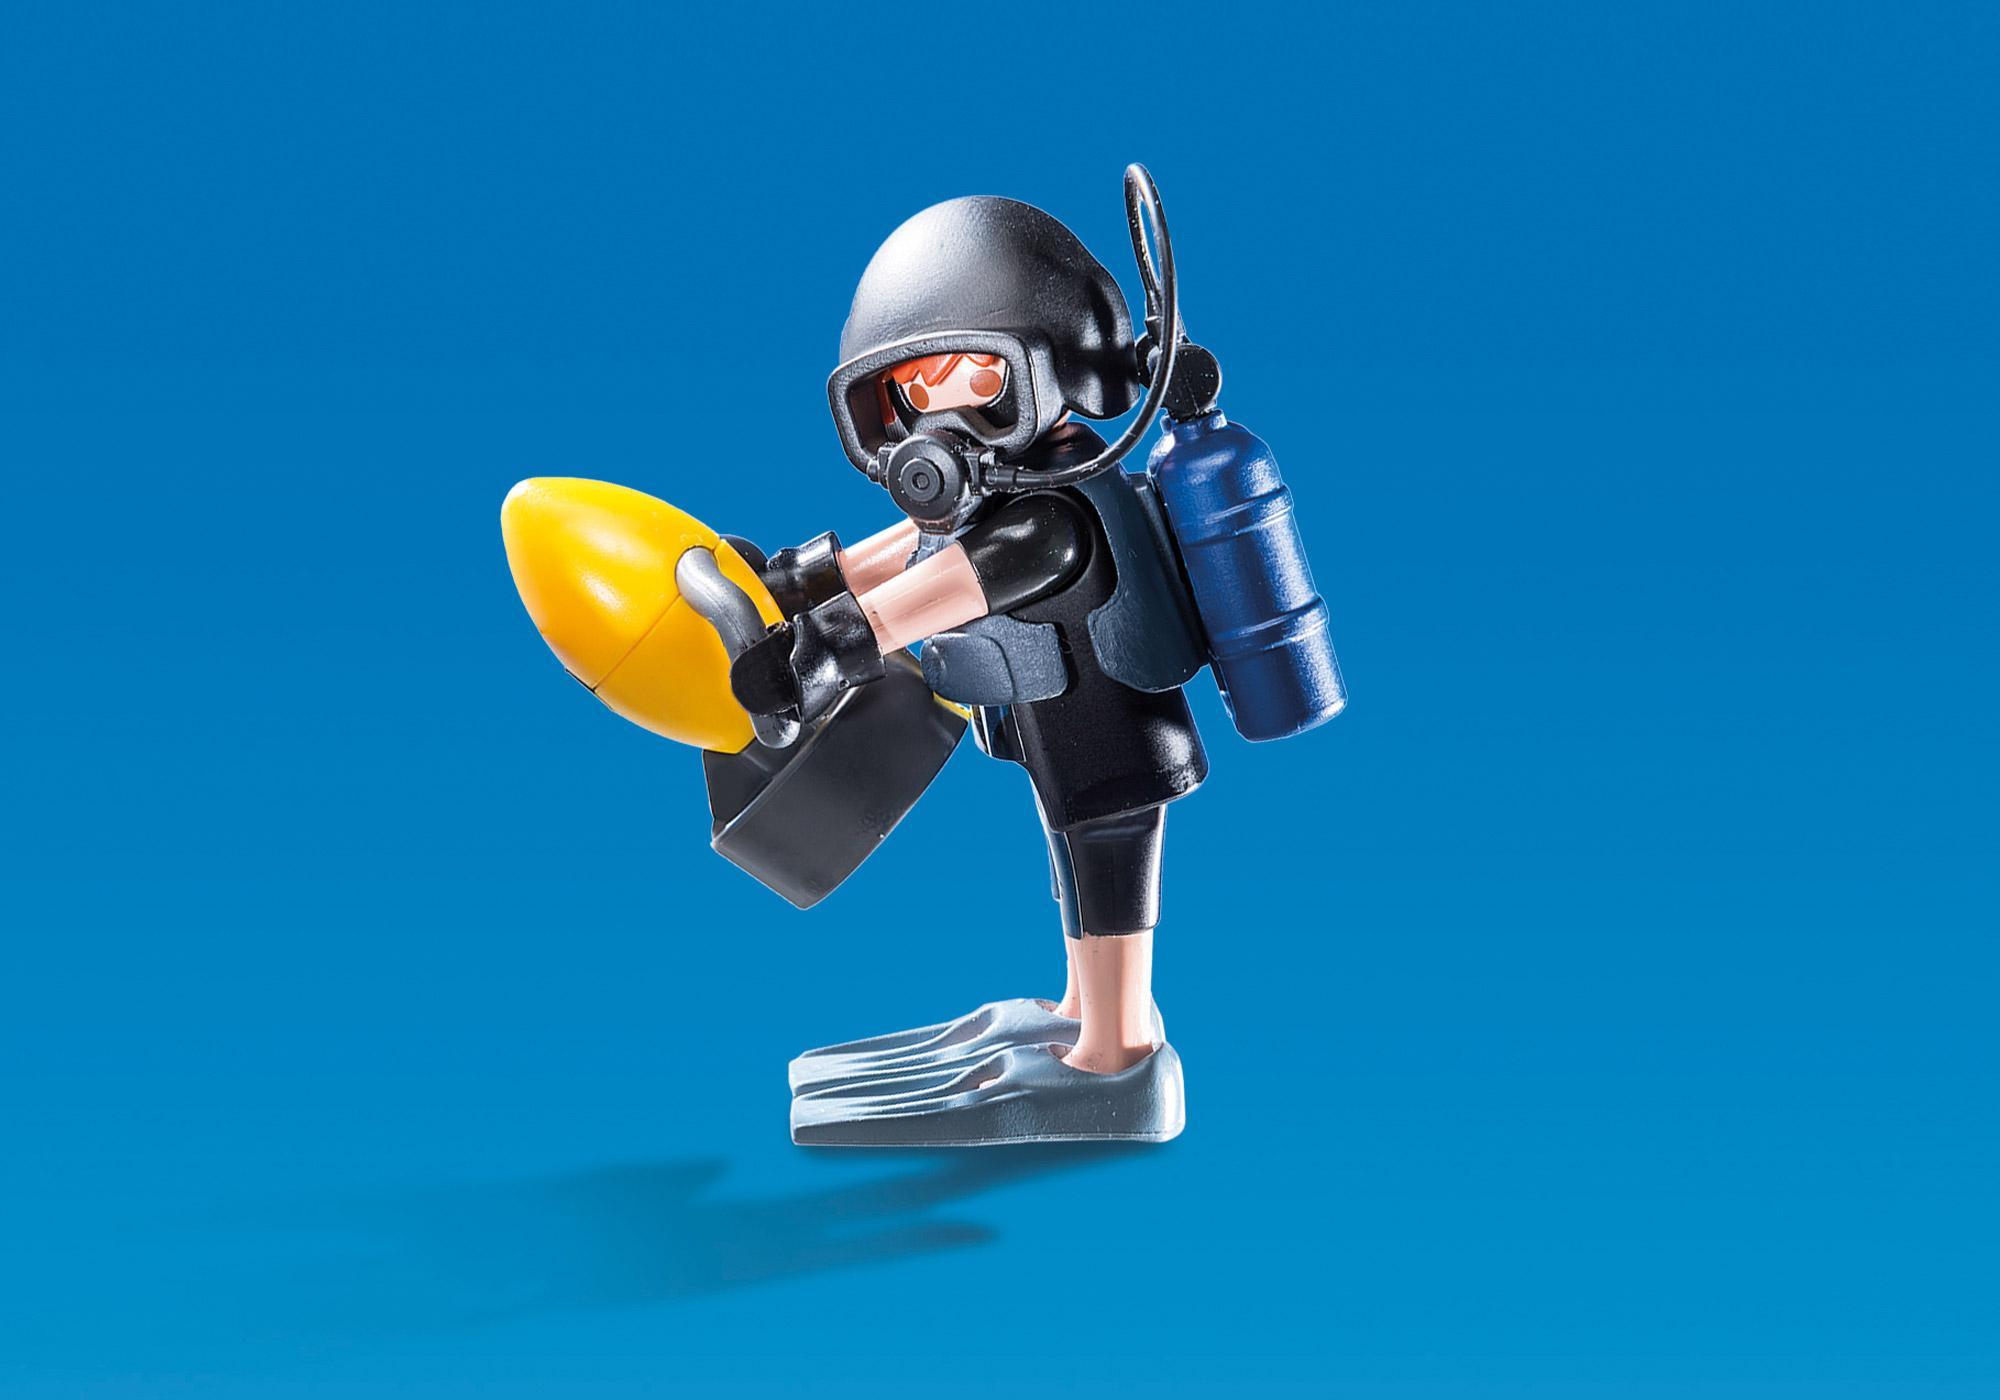 http://media.playmobil.com/i/playmobil/9363_product_extra2/Ελικόπτερο Ομάδας Ειδικών Αποστολών